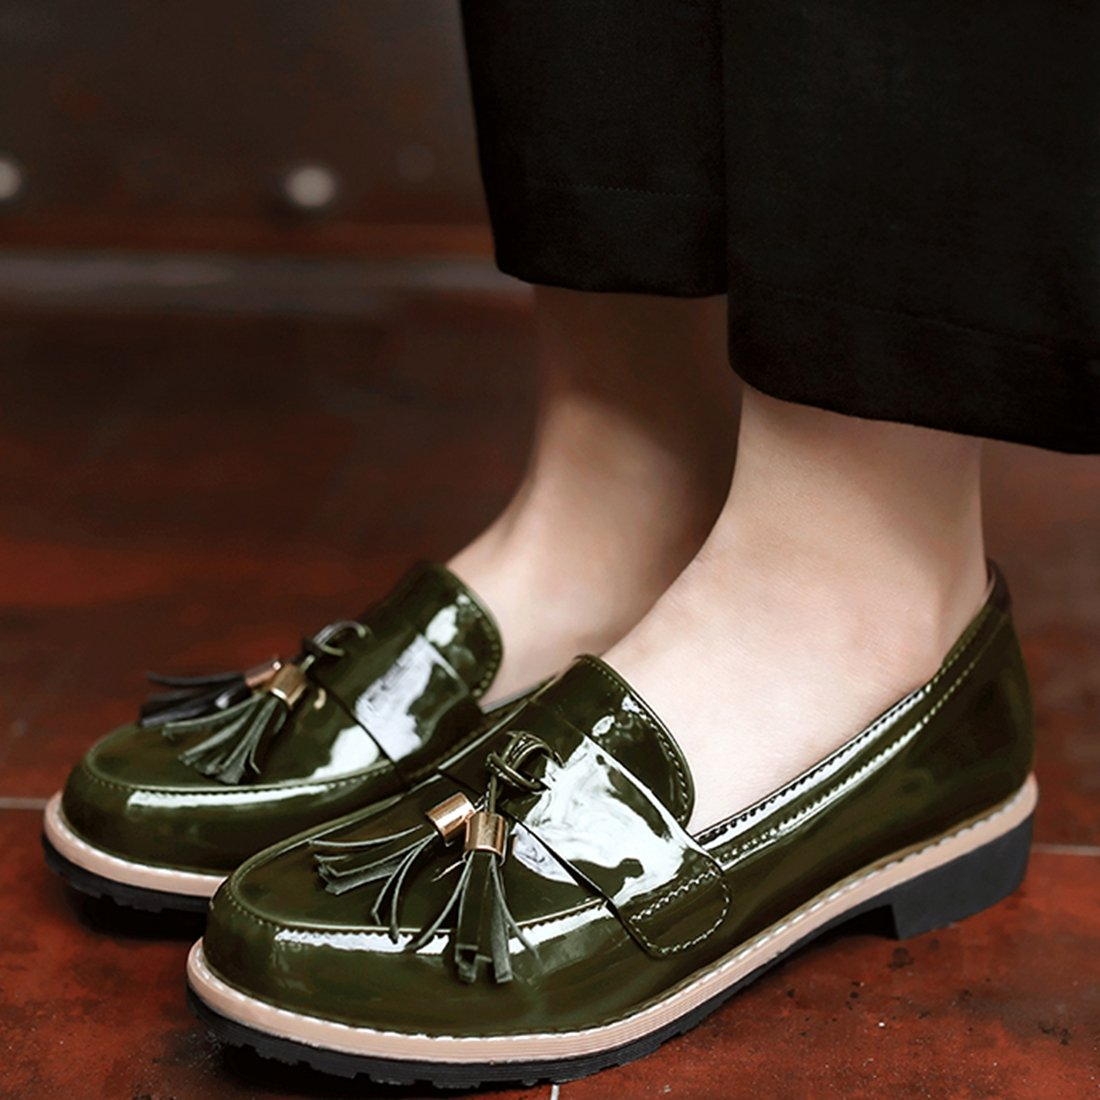 Vitalo Women's Slip On Flat Loafers Casual Ladies Vintage Fringe Tassel Work School Pumps Shoes UK Size 2-8